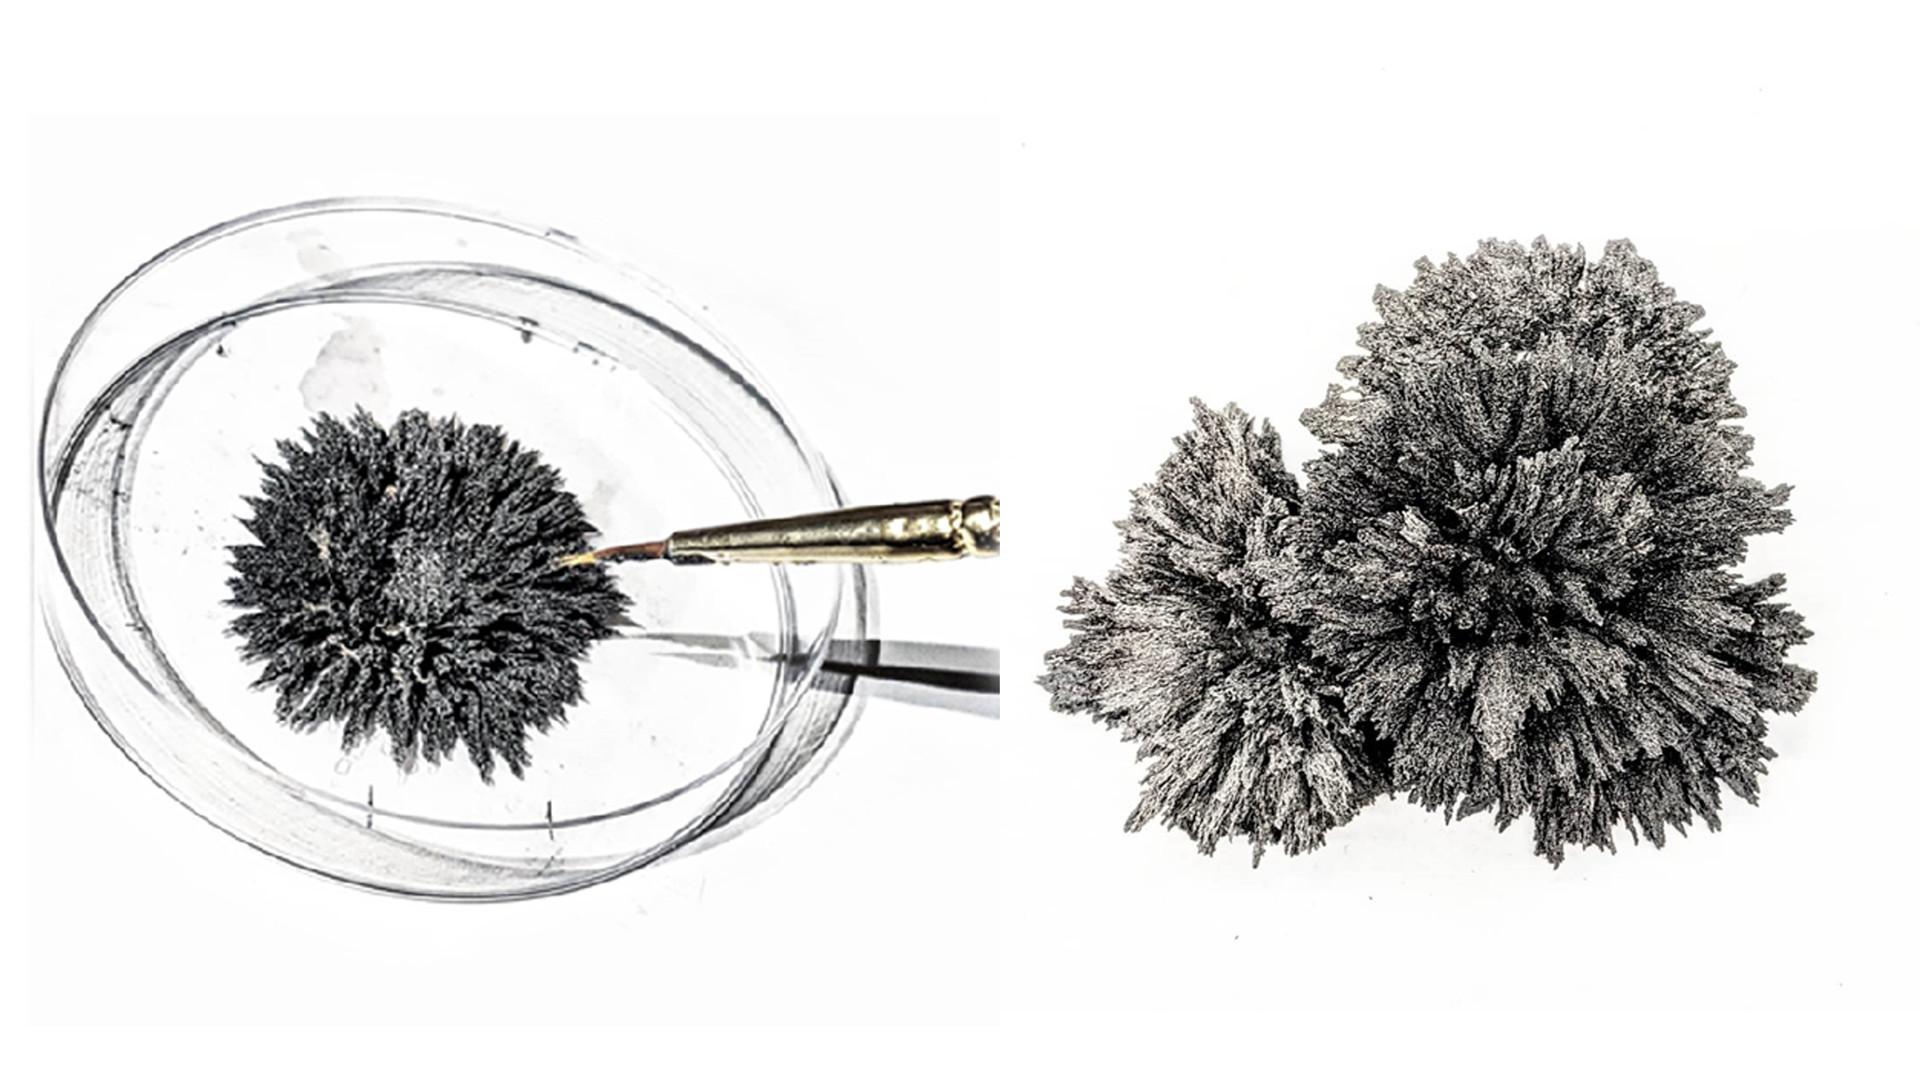 Iron + Magnets